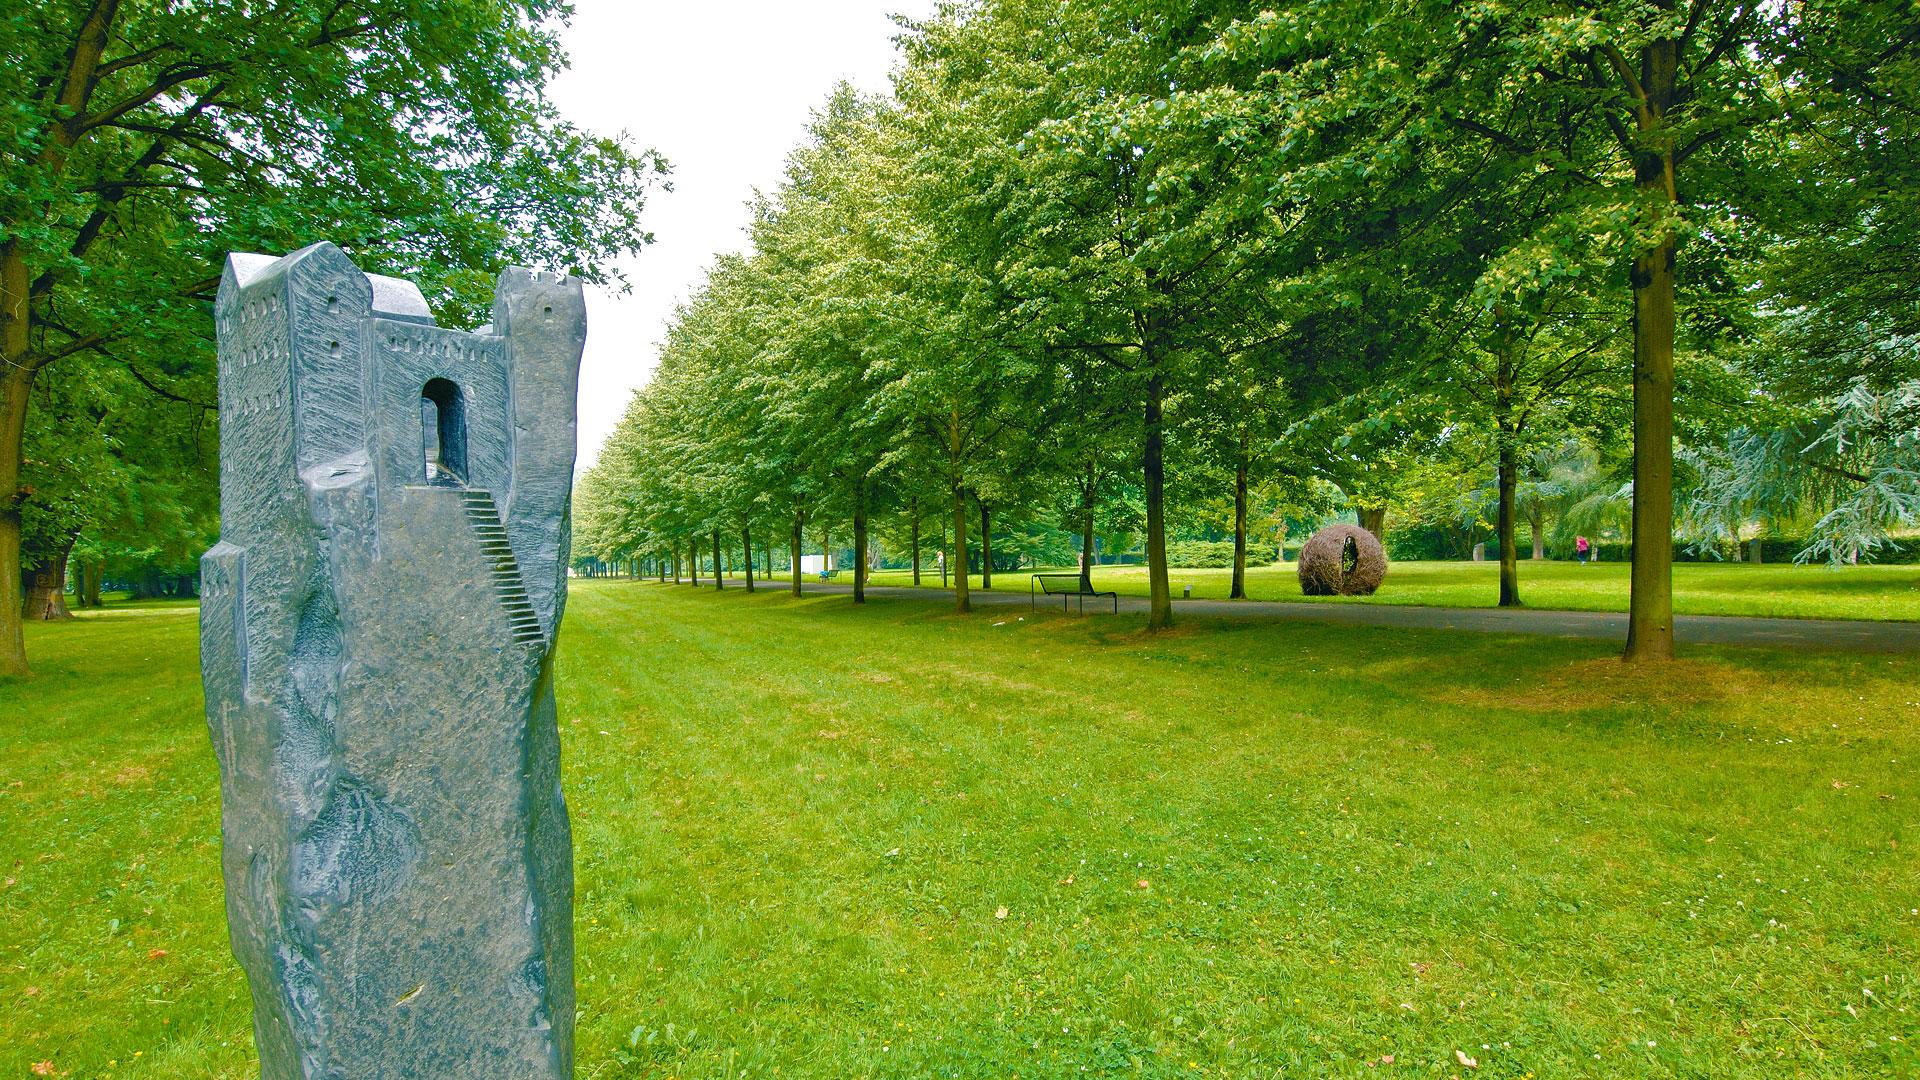 Oehler Steinmetz & Bildhauermeister Köln - Feste Burg